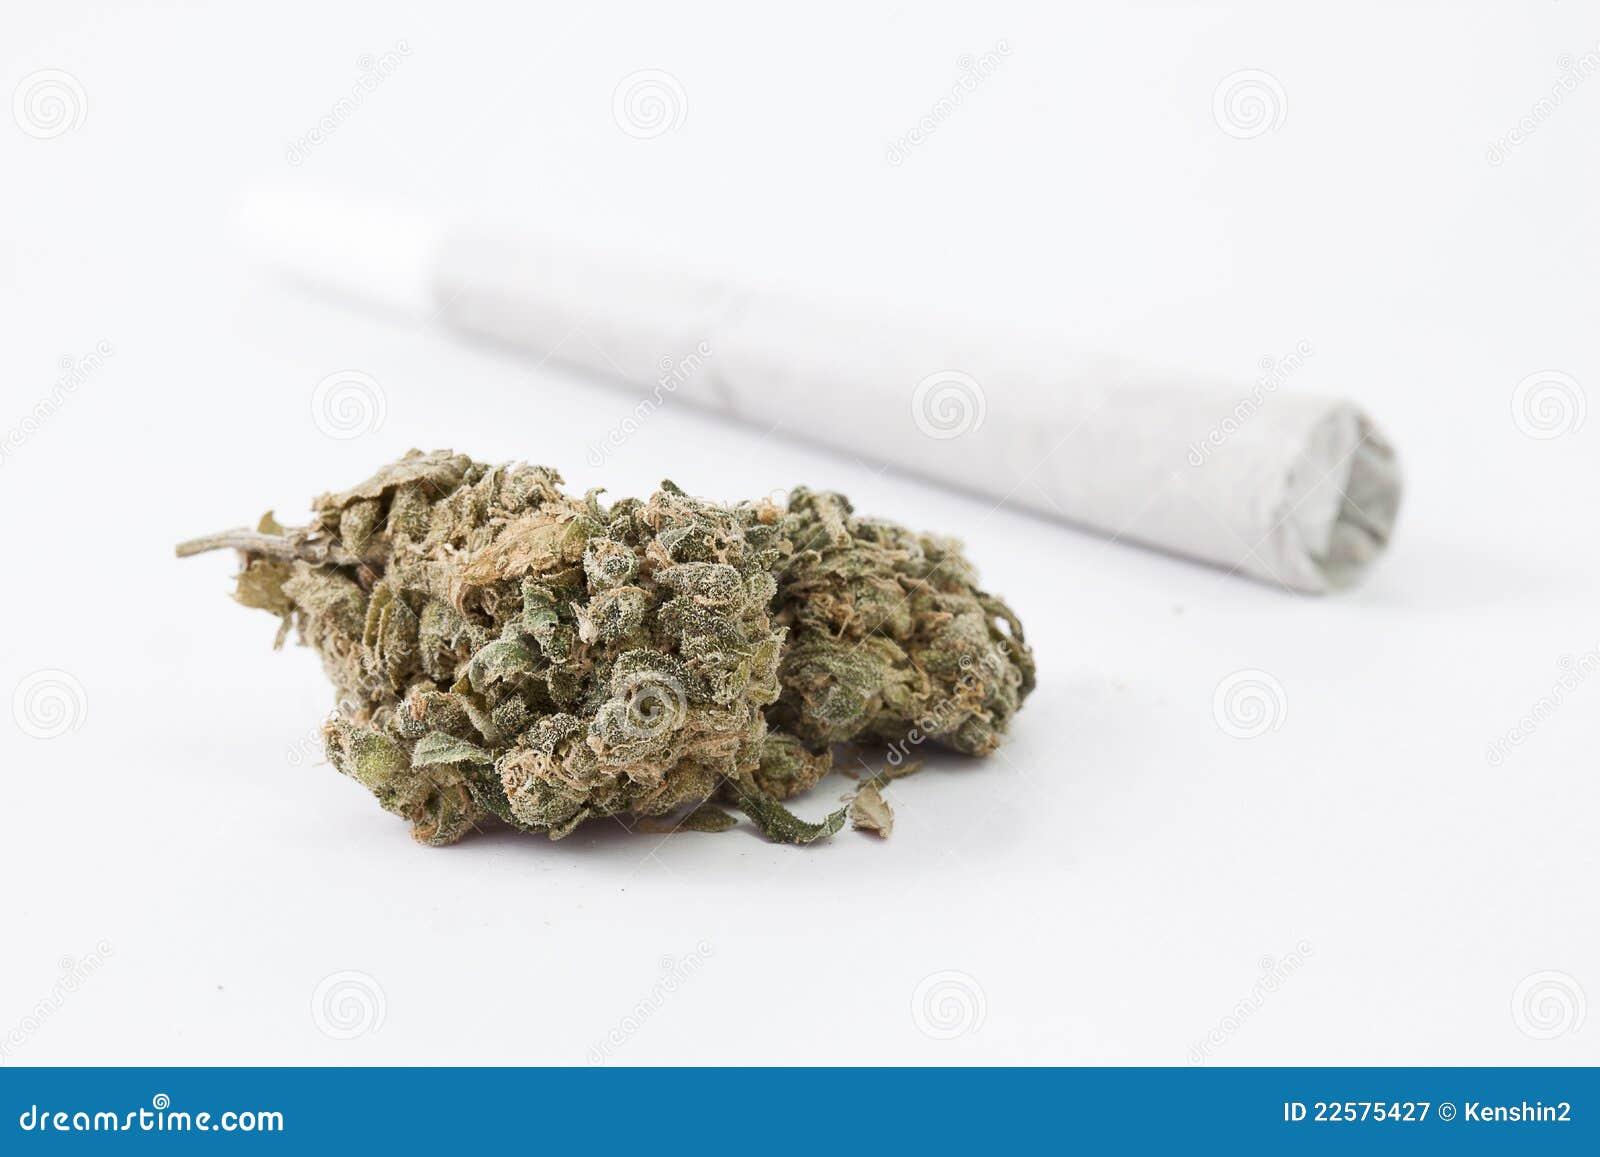 Cannabisskarv